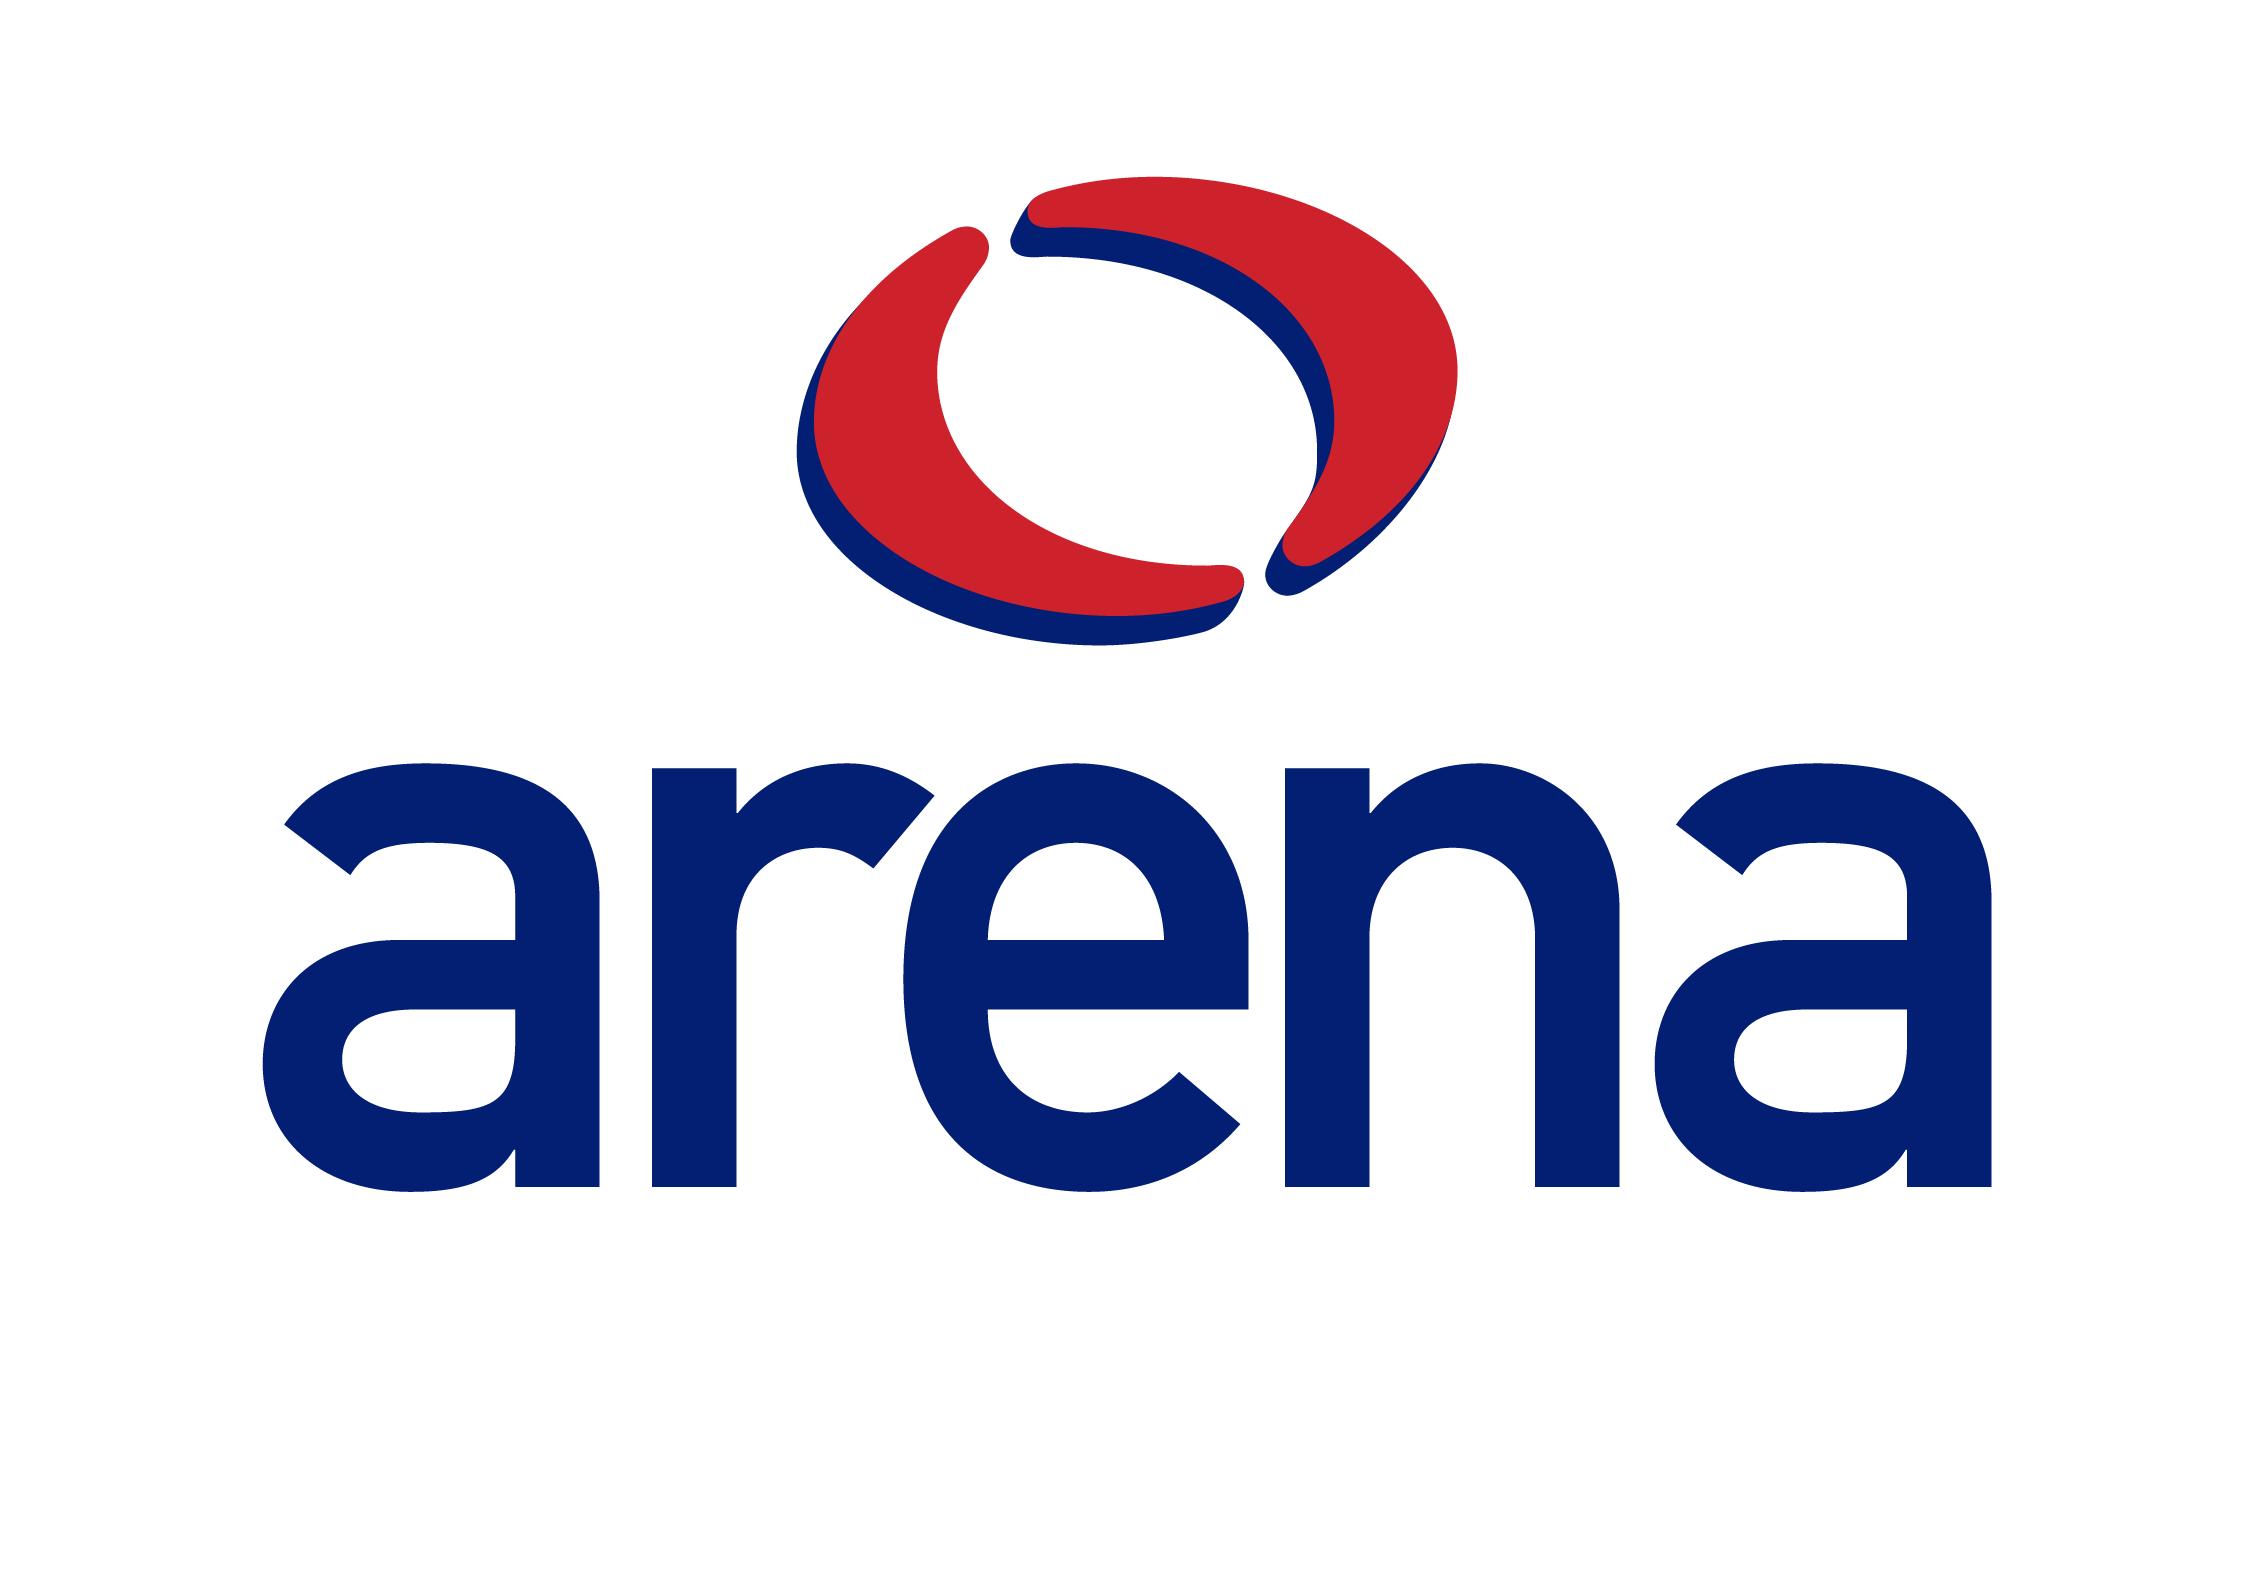 Director, Arena Seating